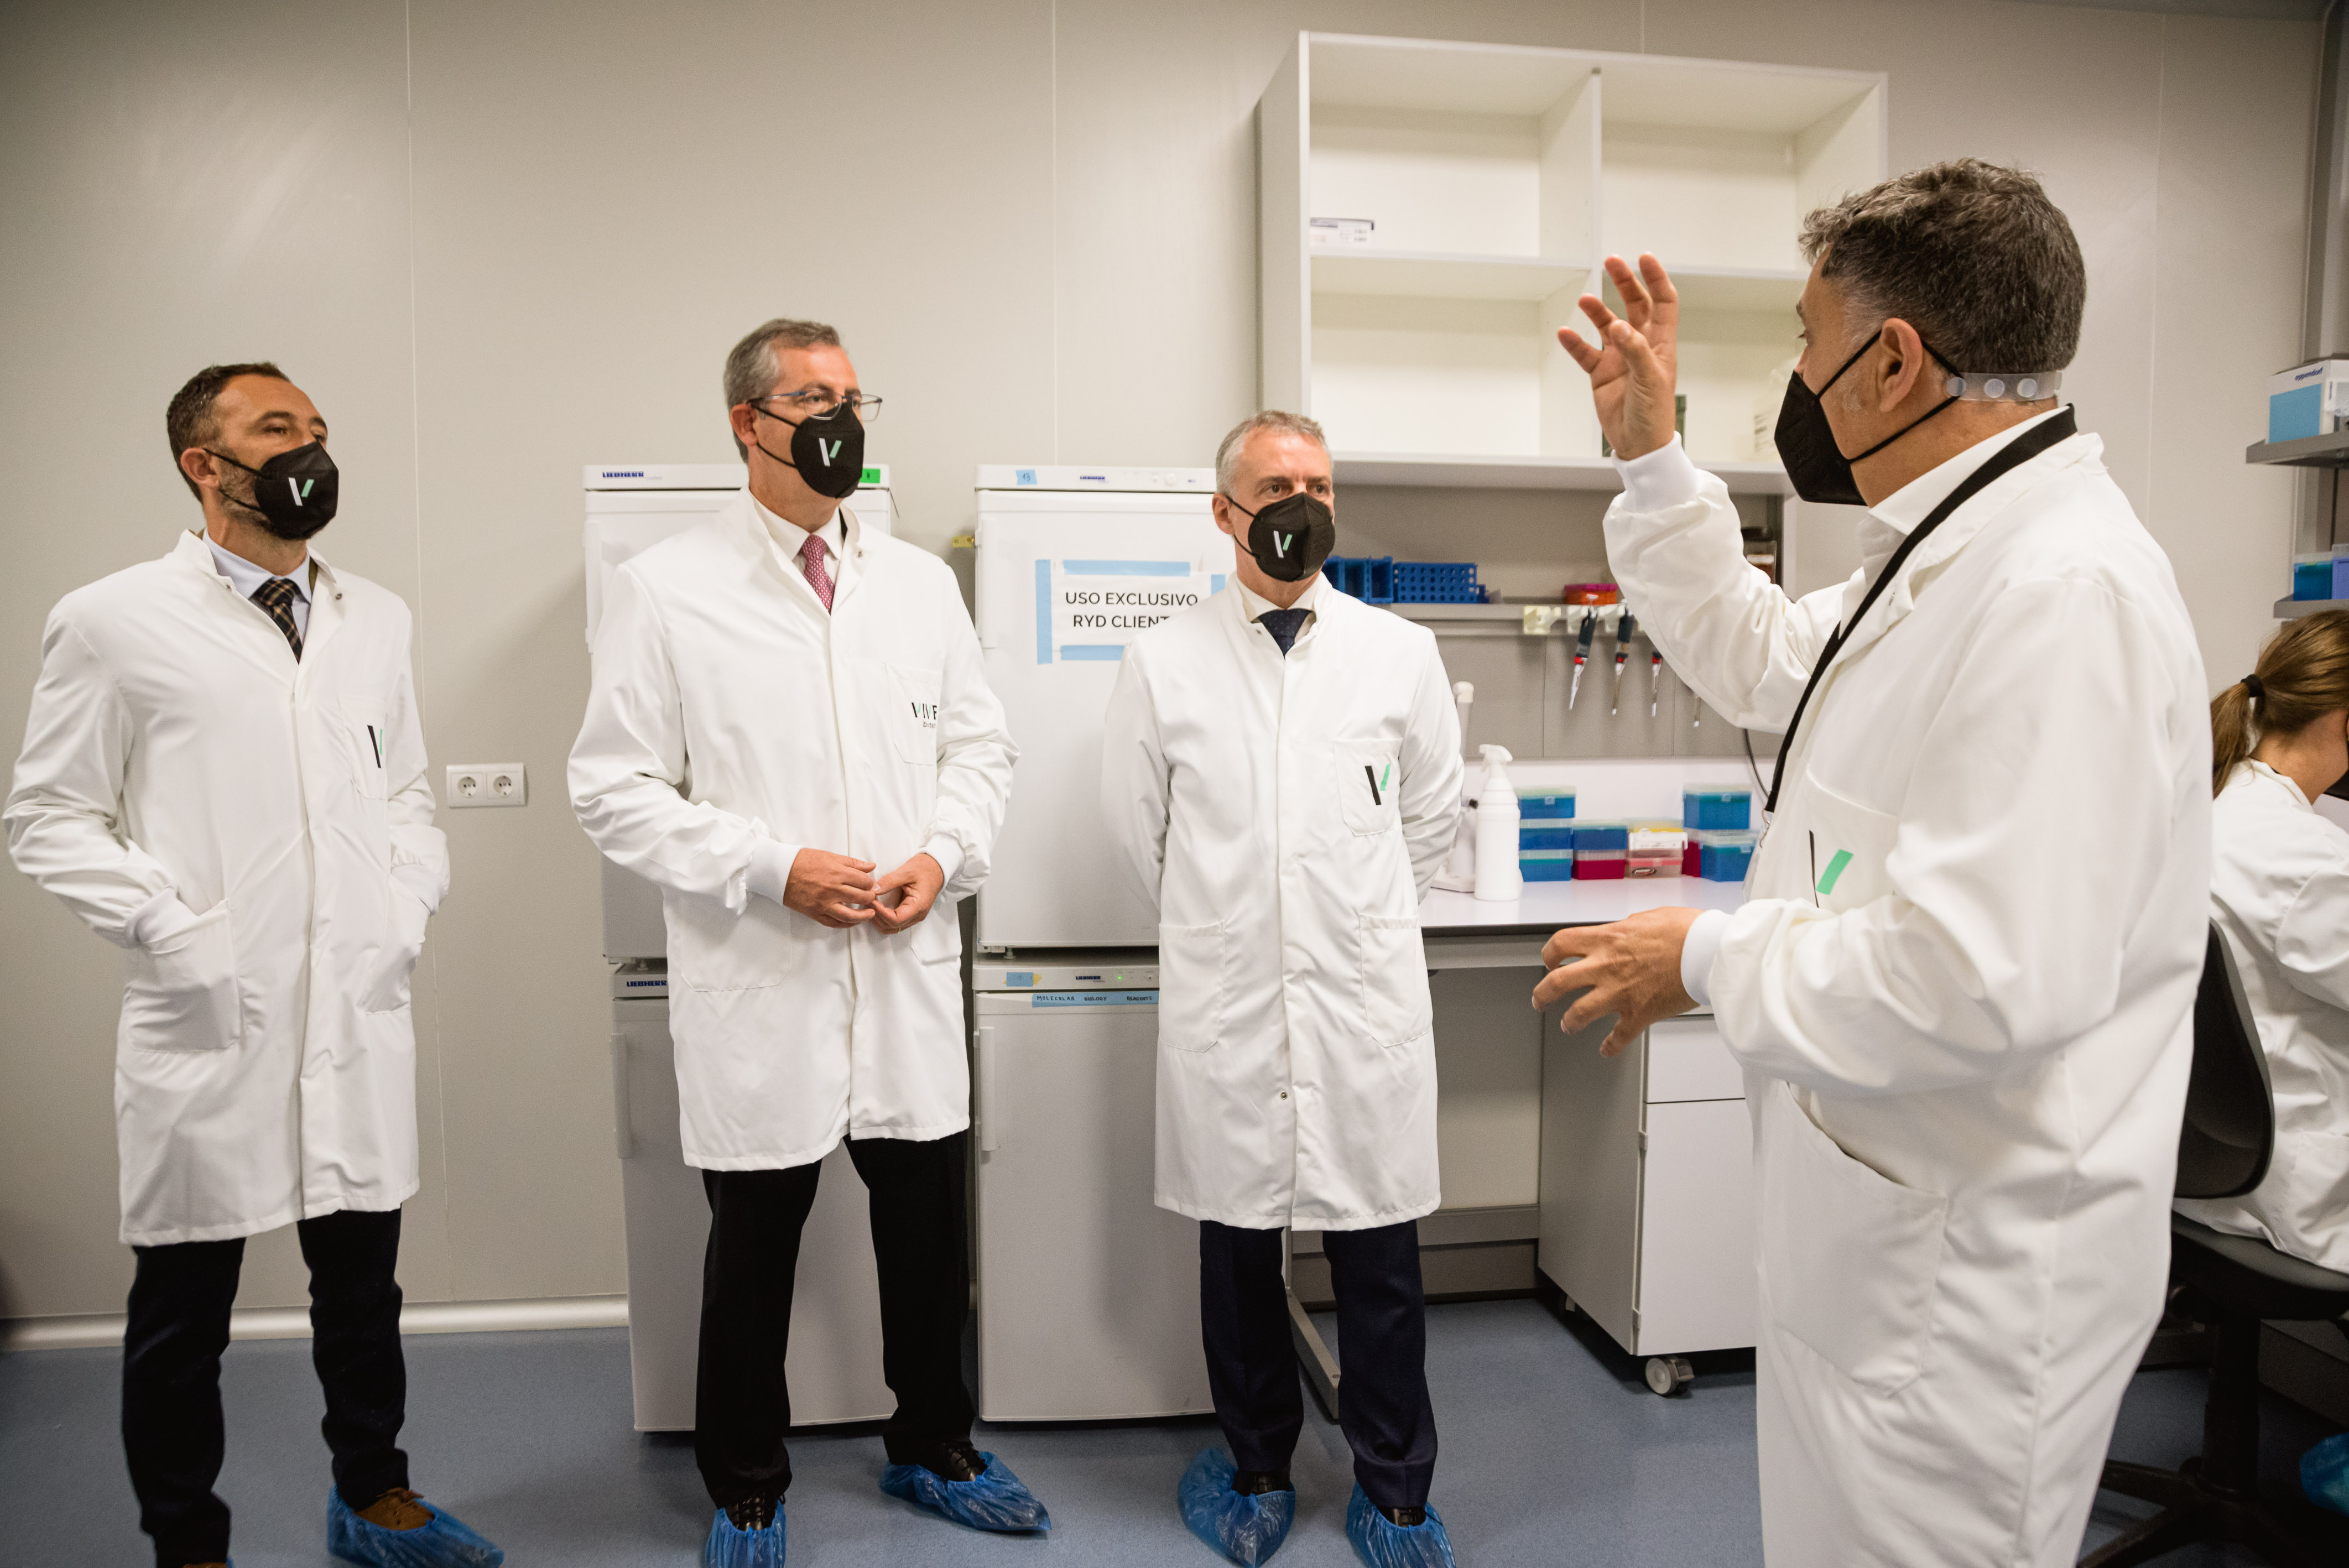 vivebiotech_donosti4-6-2021_usual-7721.jpg